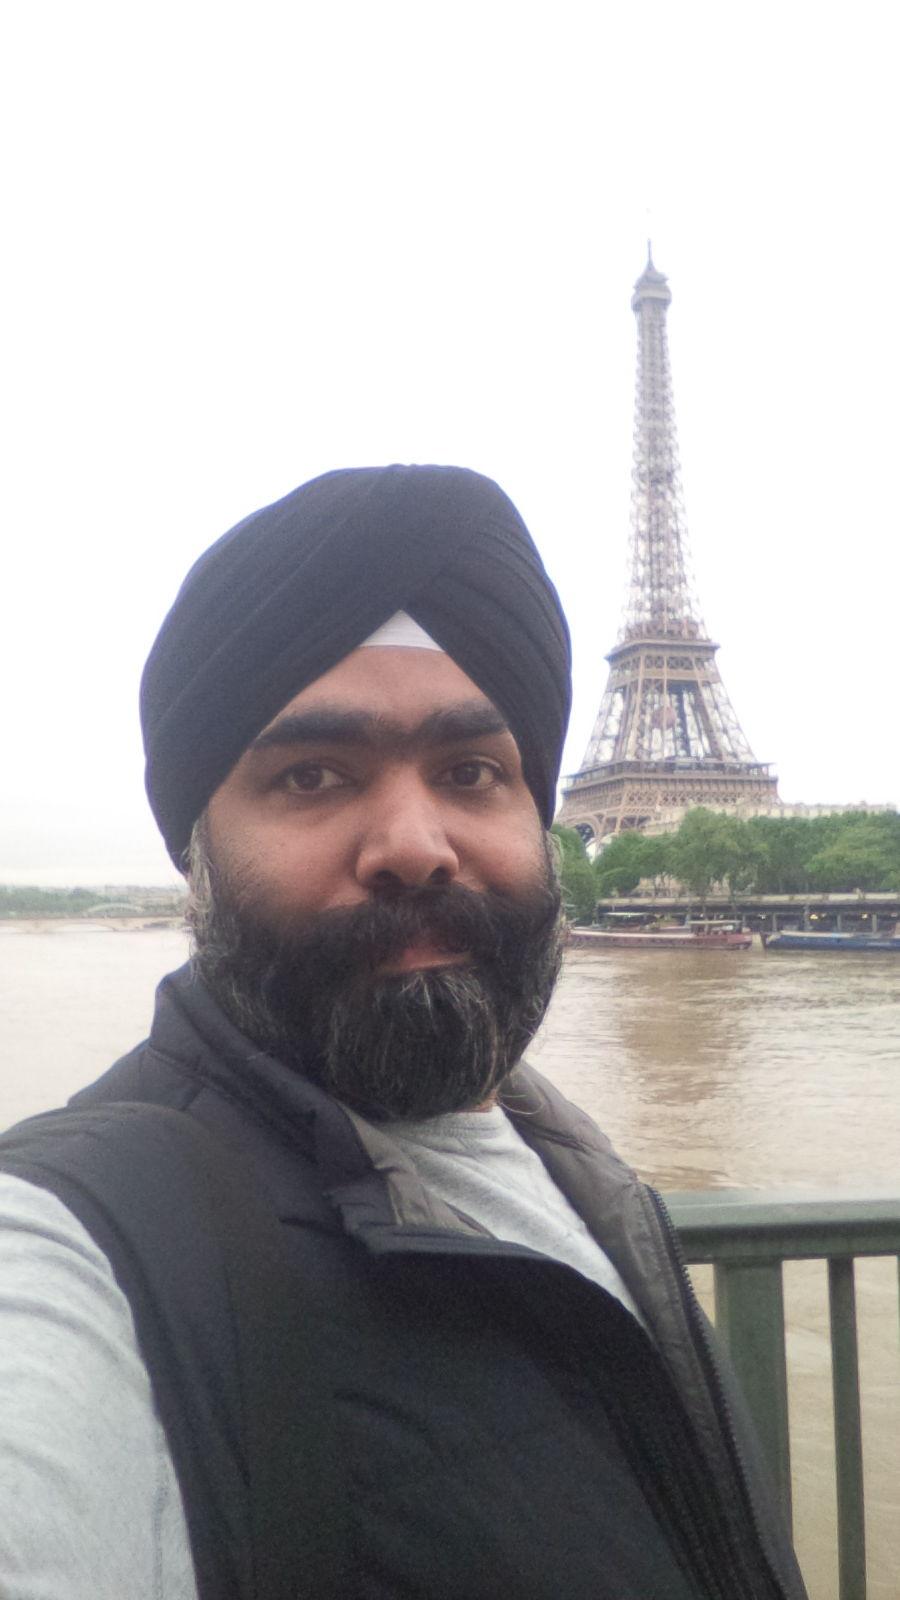 Photo of Eiffel Tower By Charandeep Singh